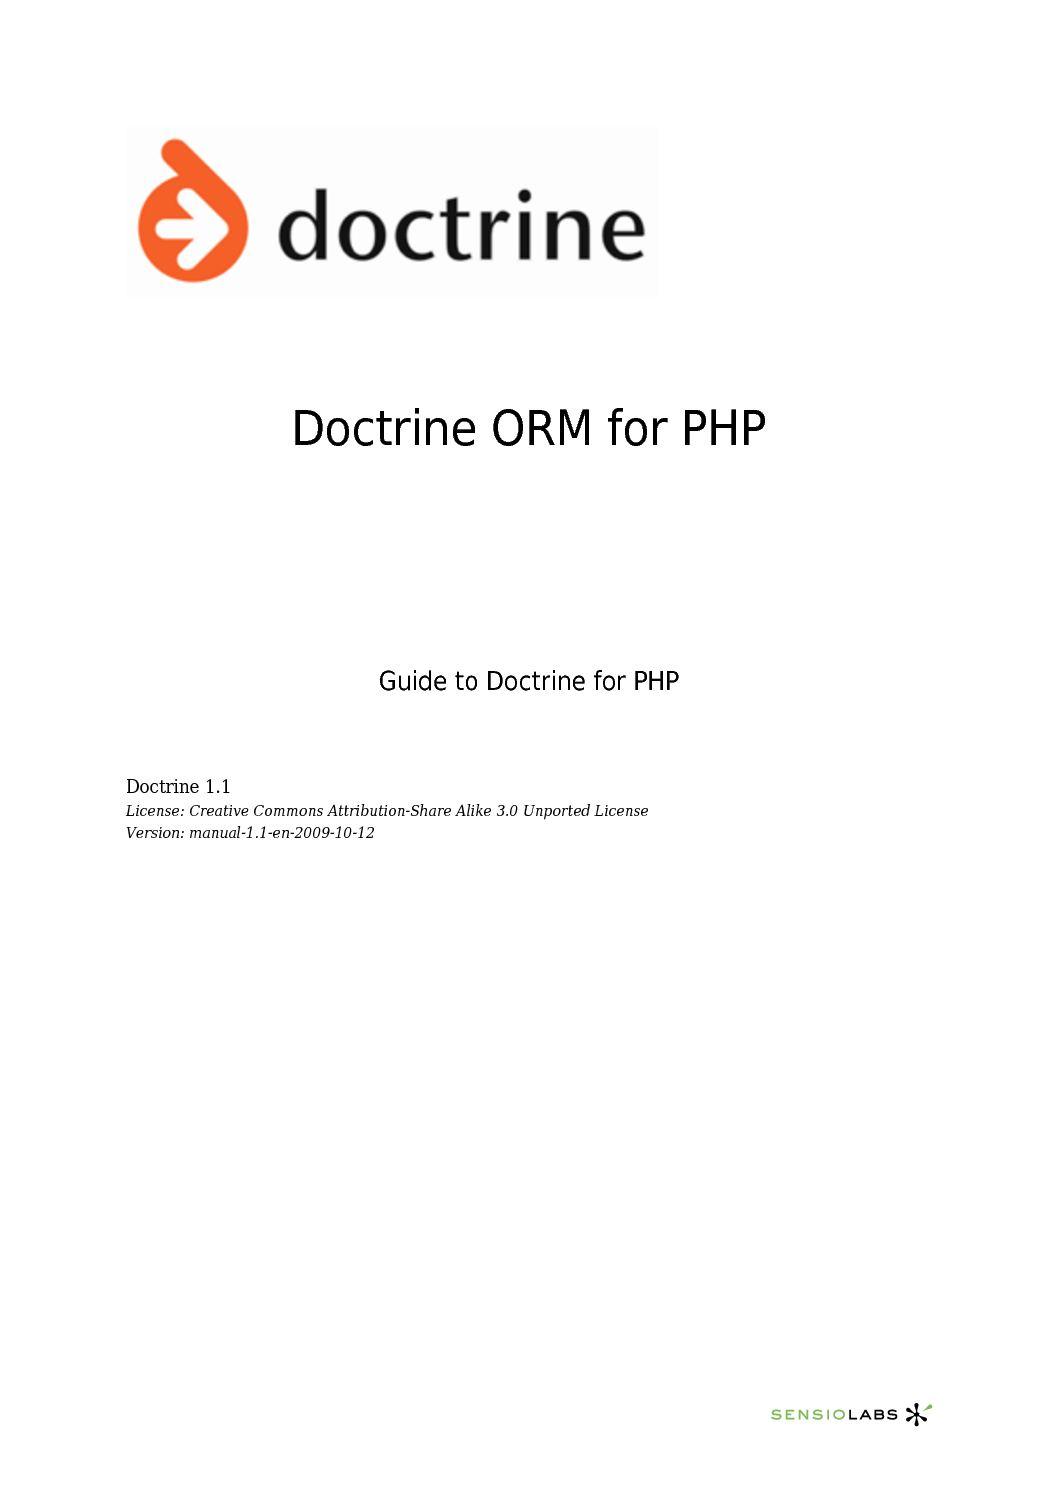 Doctrine Findby